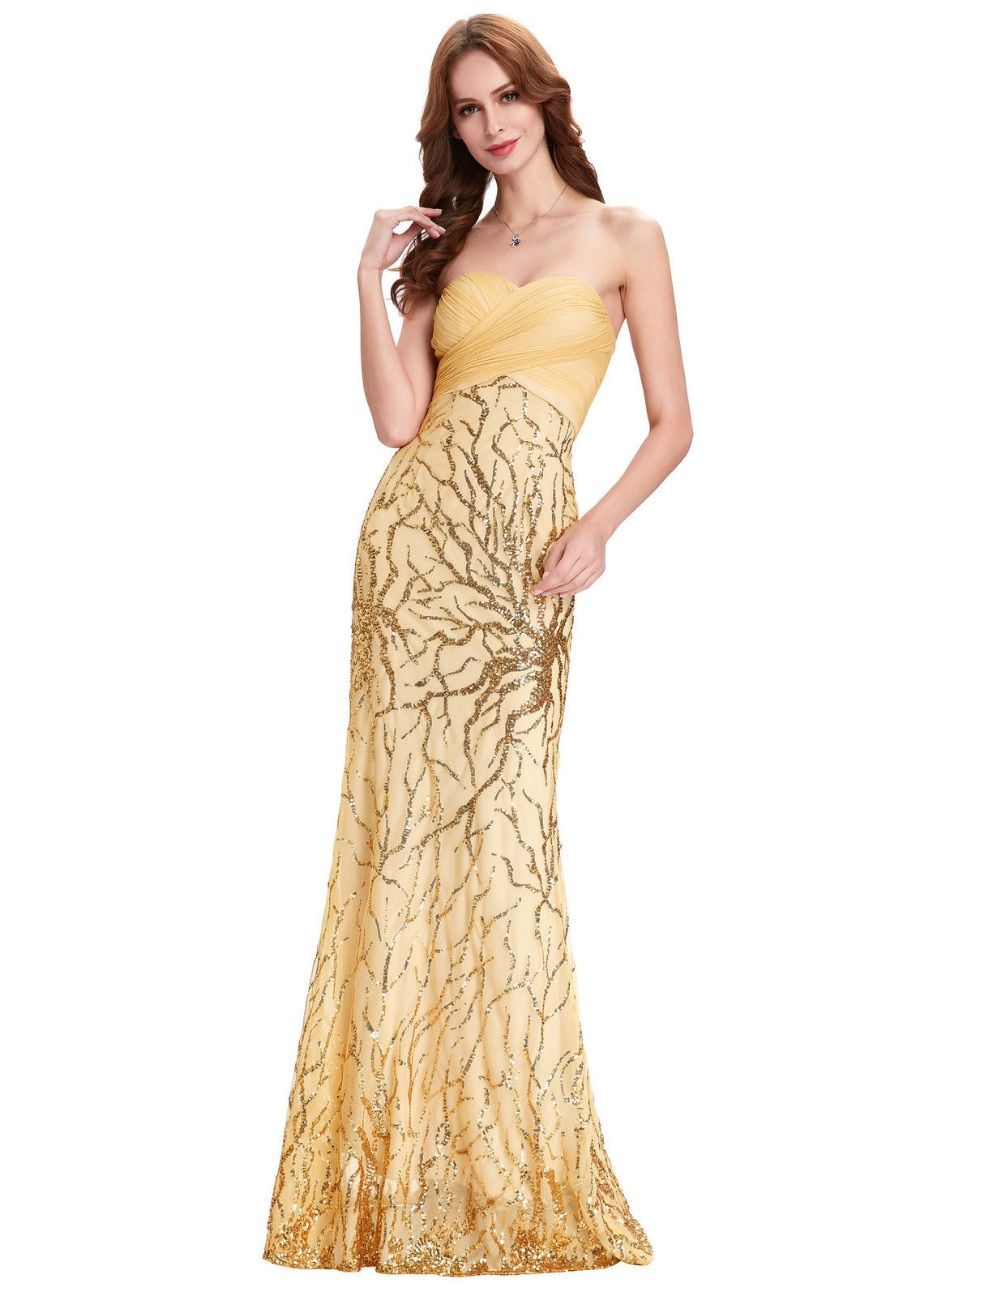 rose gold sequin dress australia